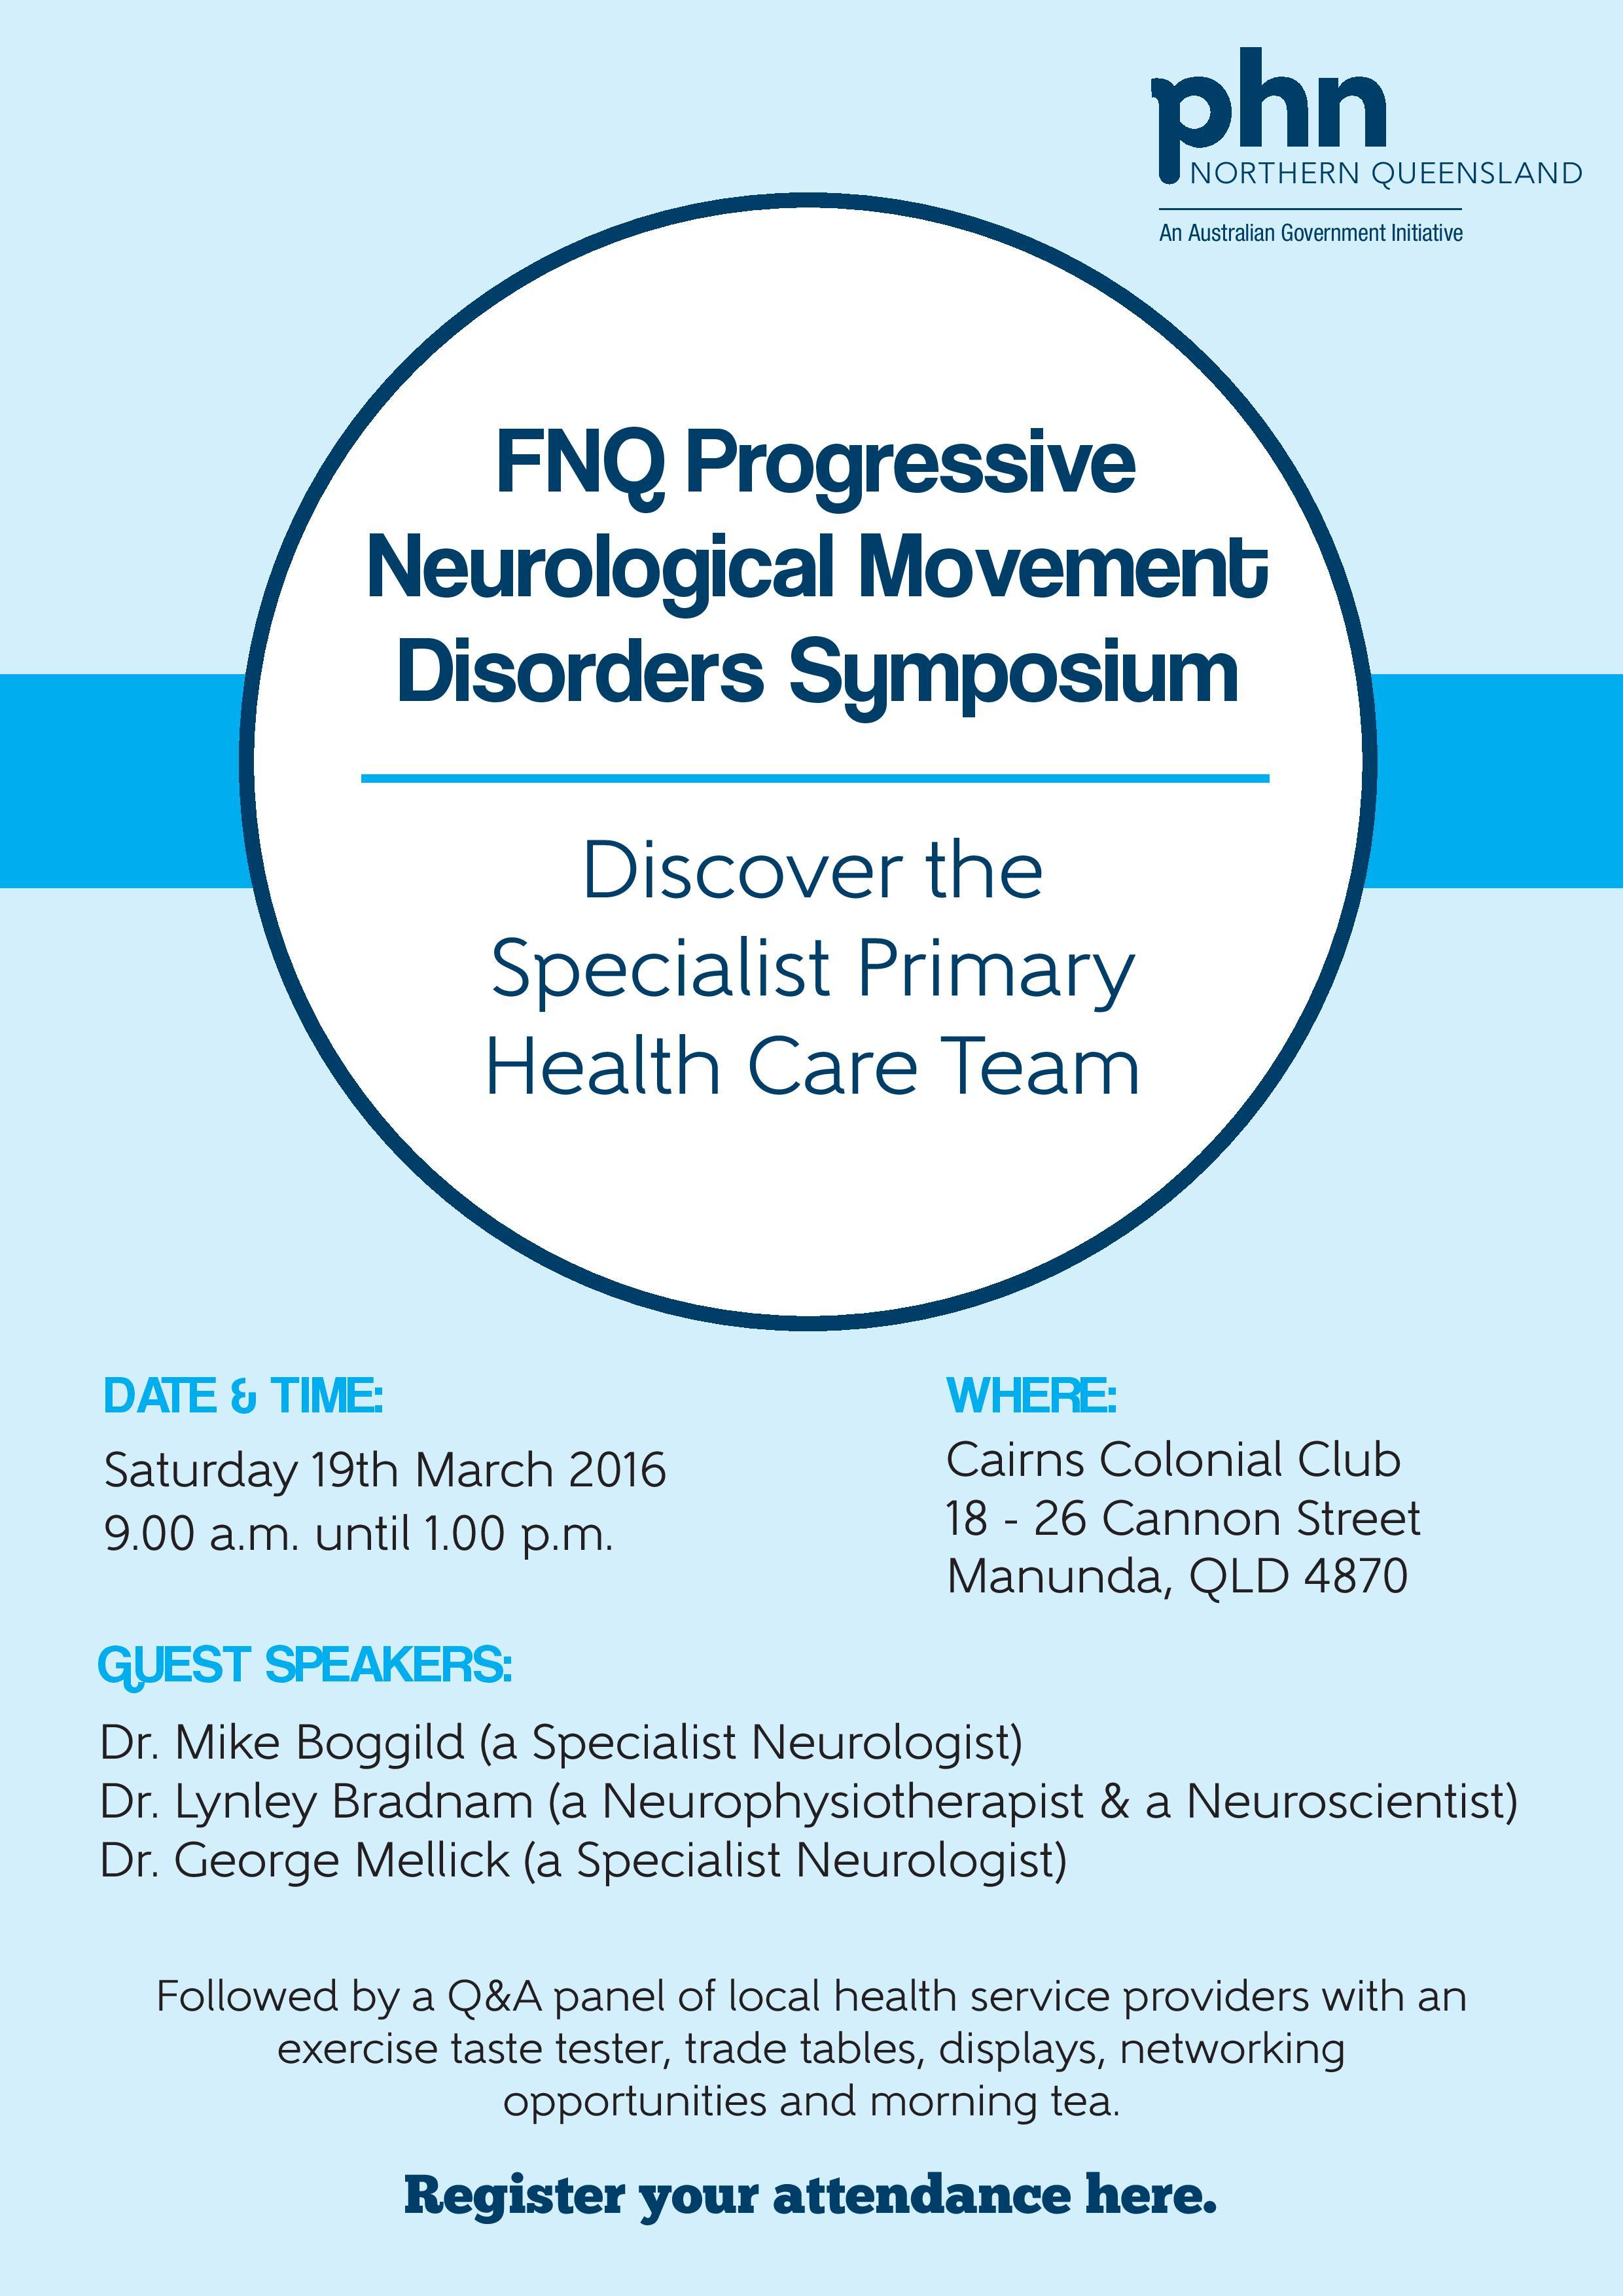 Attend a Progressive Neurological Movement Disorders